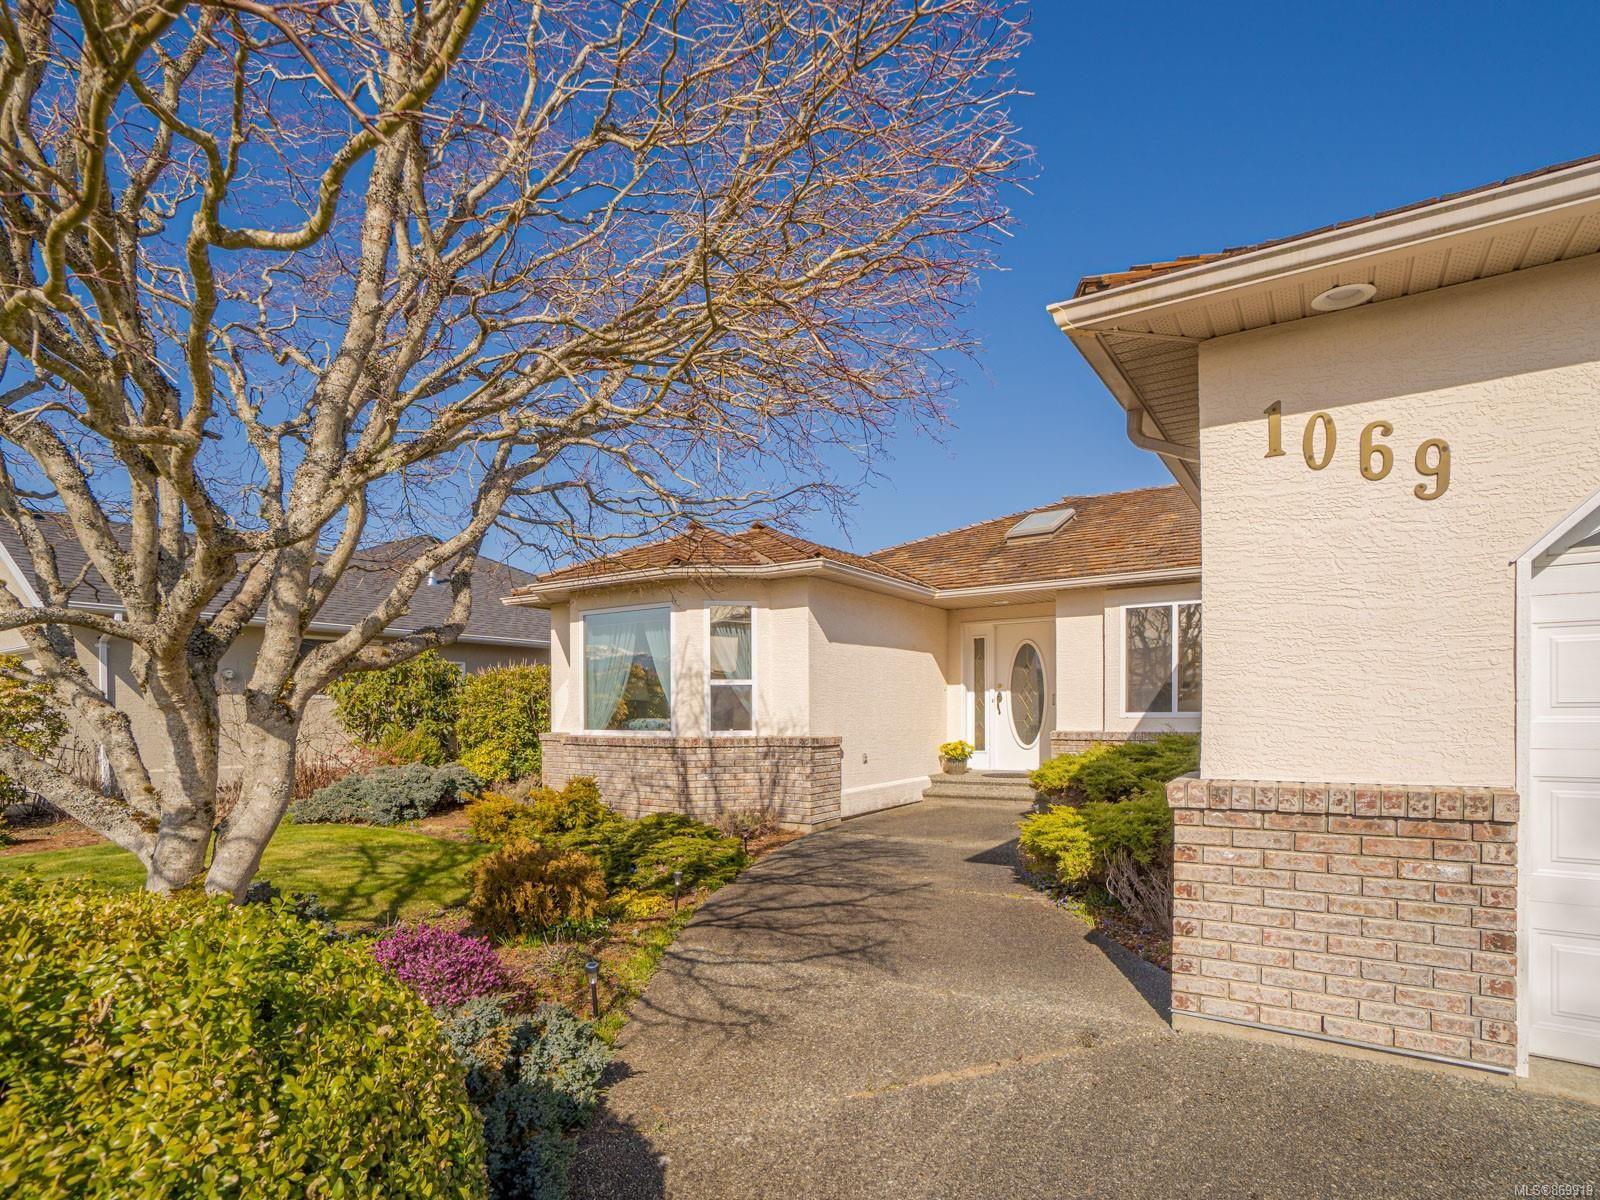 Main Photo: 1069 WINDSOR Dr in : PQ Qualicum Beach House for sale (Parksville/Qualicum)  : MLS®# 869919